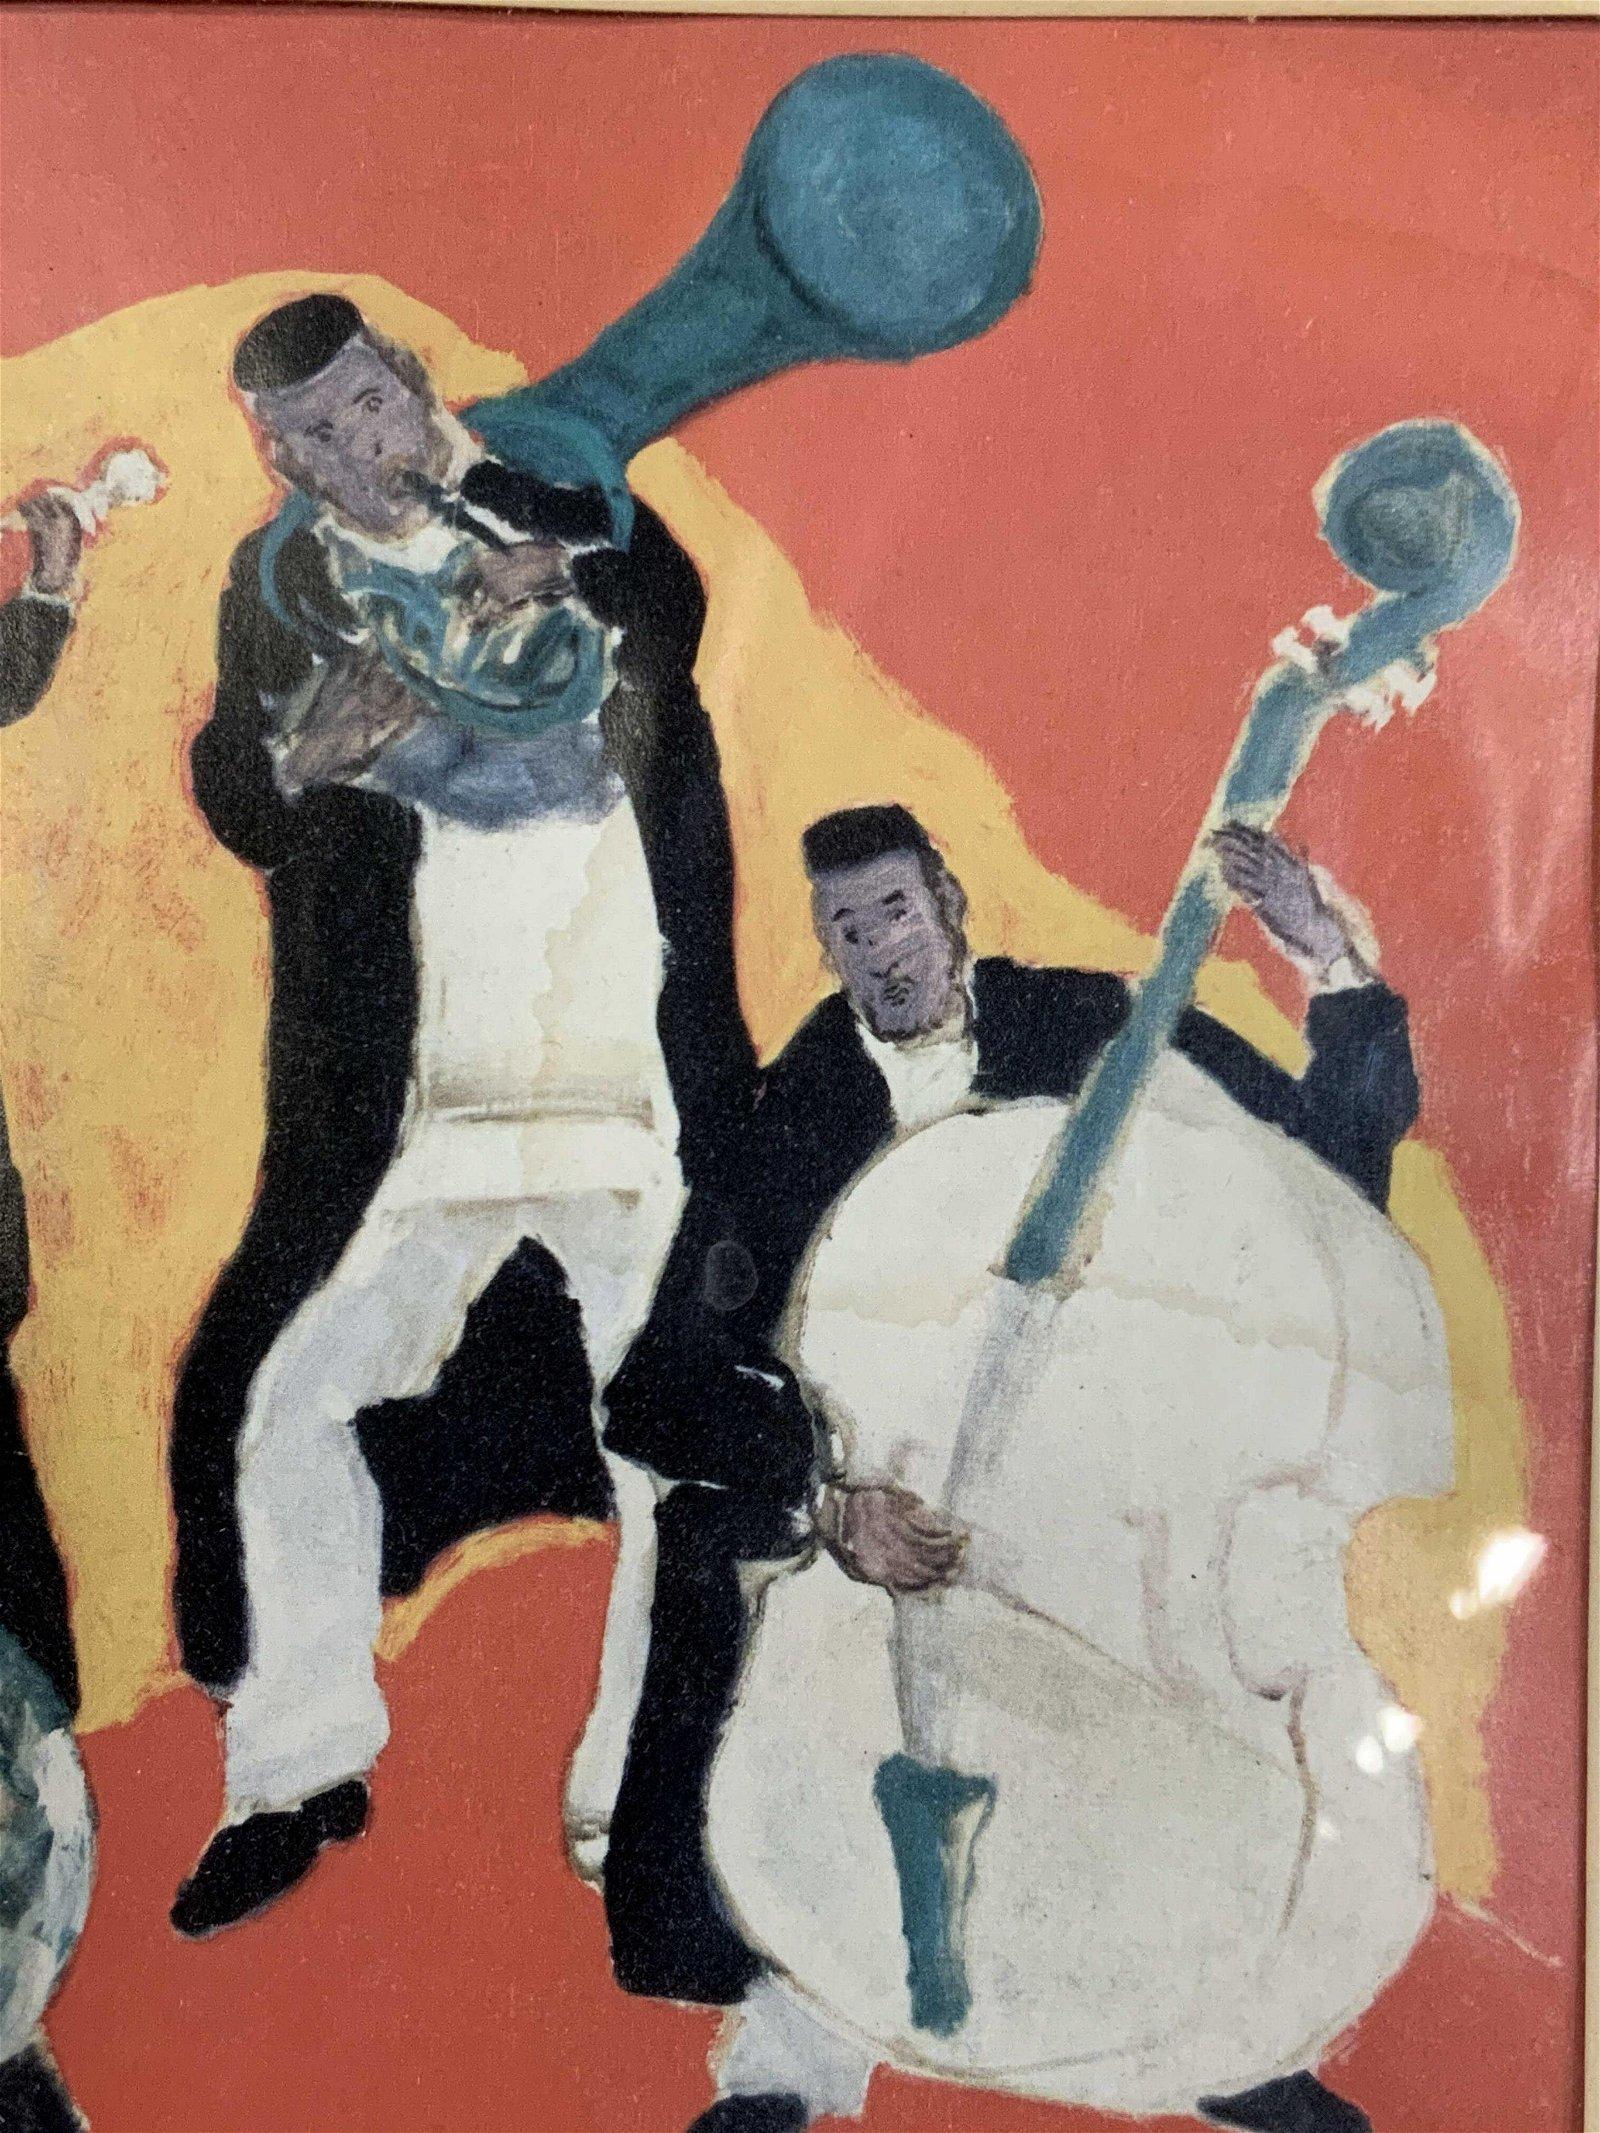 Mané-Katz Print of Men Playing Music